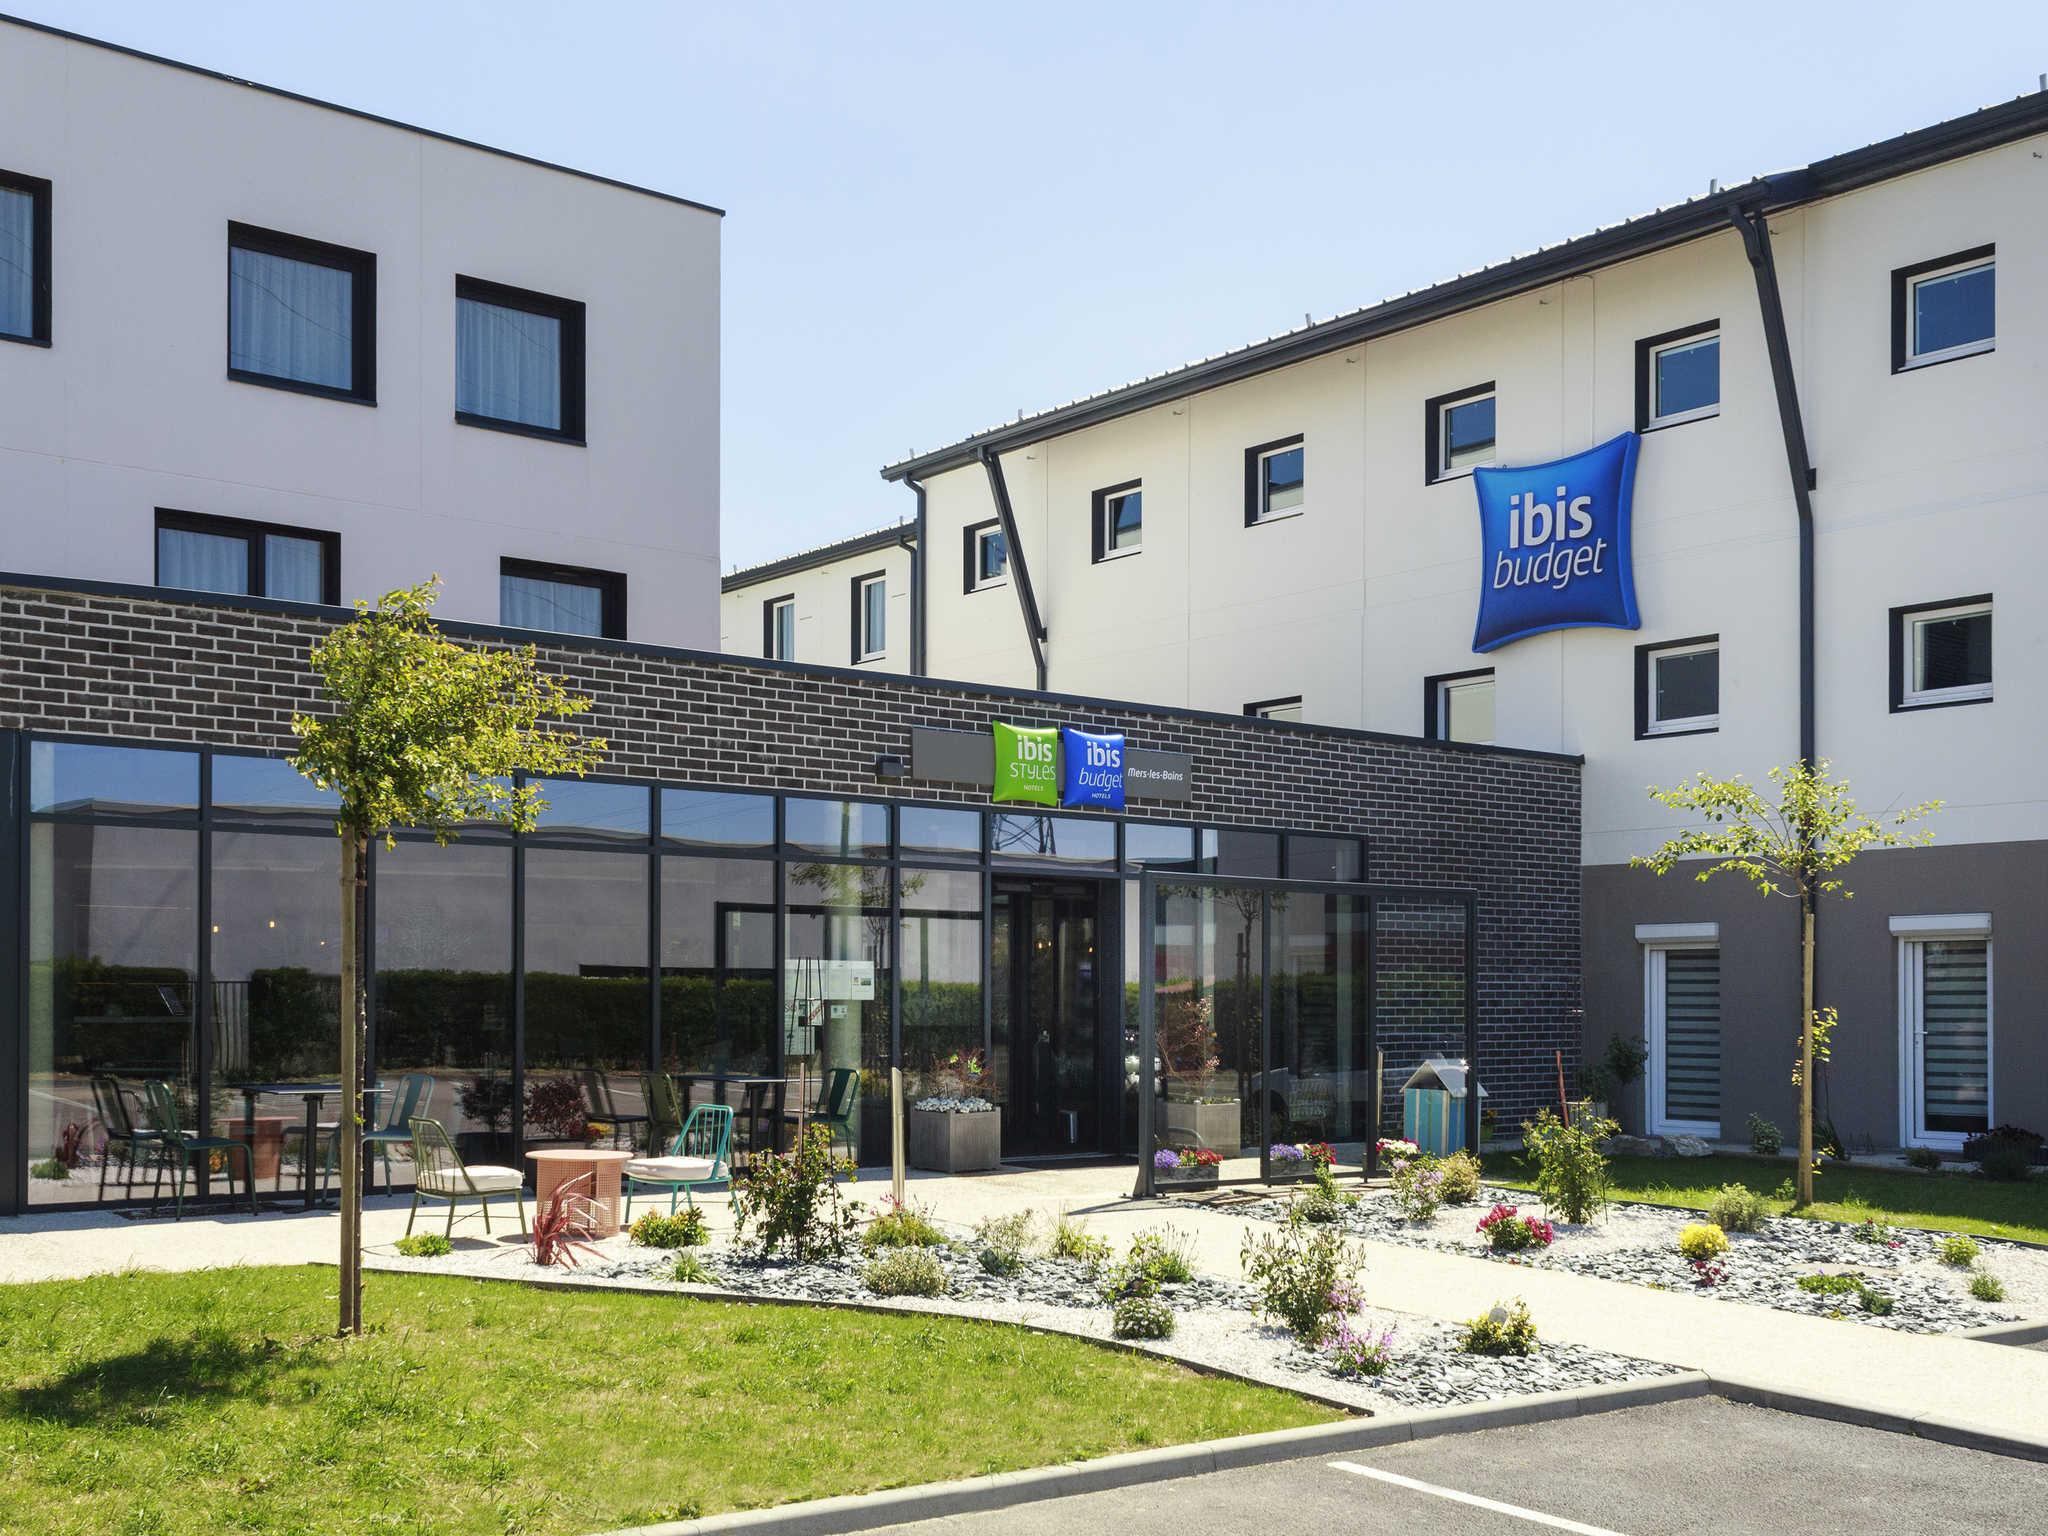 فندق - ibis budget Le Tréport Mers-les-Bains